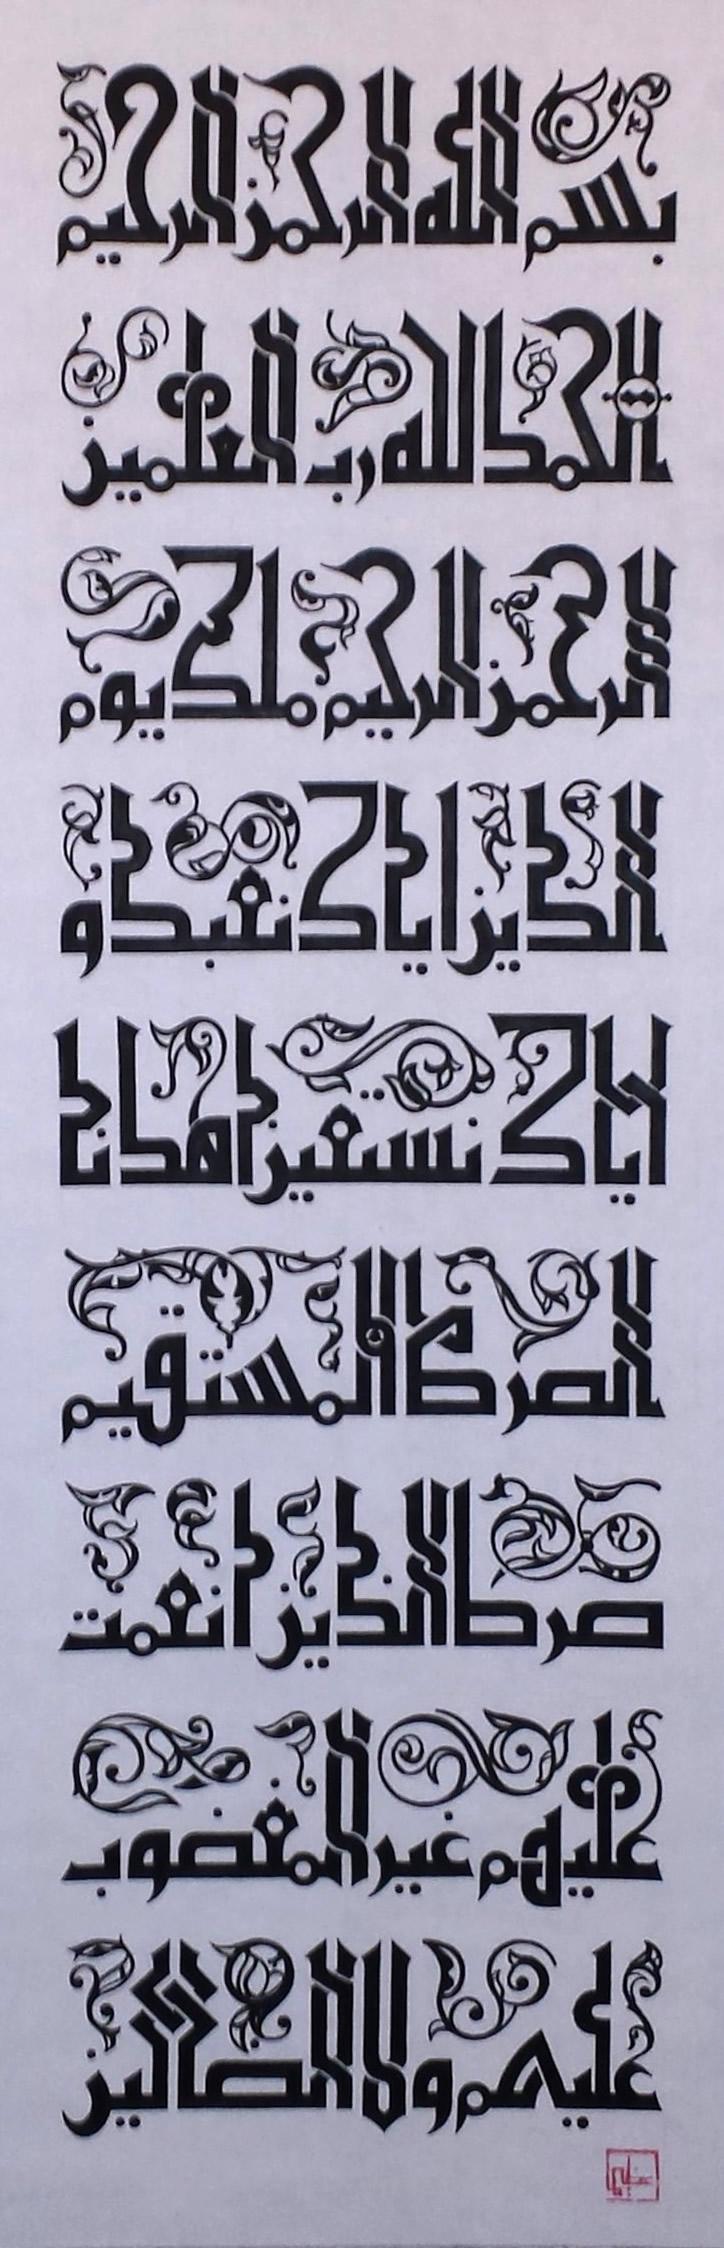 Desertrose Al Fatihah In The Kufic Style For Sale 140 Www Azimrehmatdin Com Calligraphy Words Islamic Calligraphy Islamic Calligraphy Painting